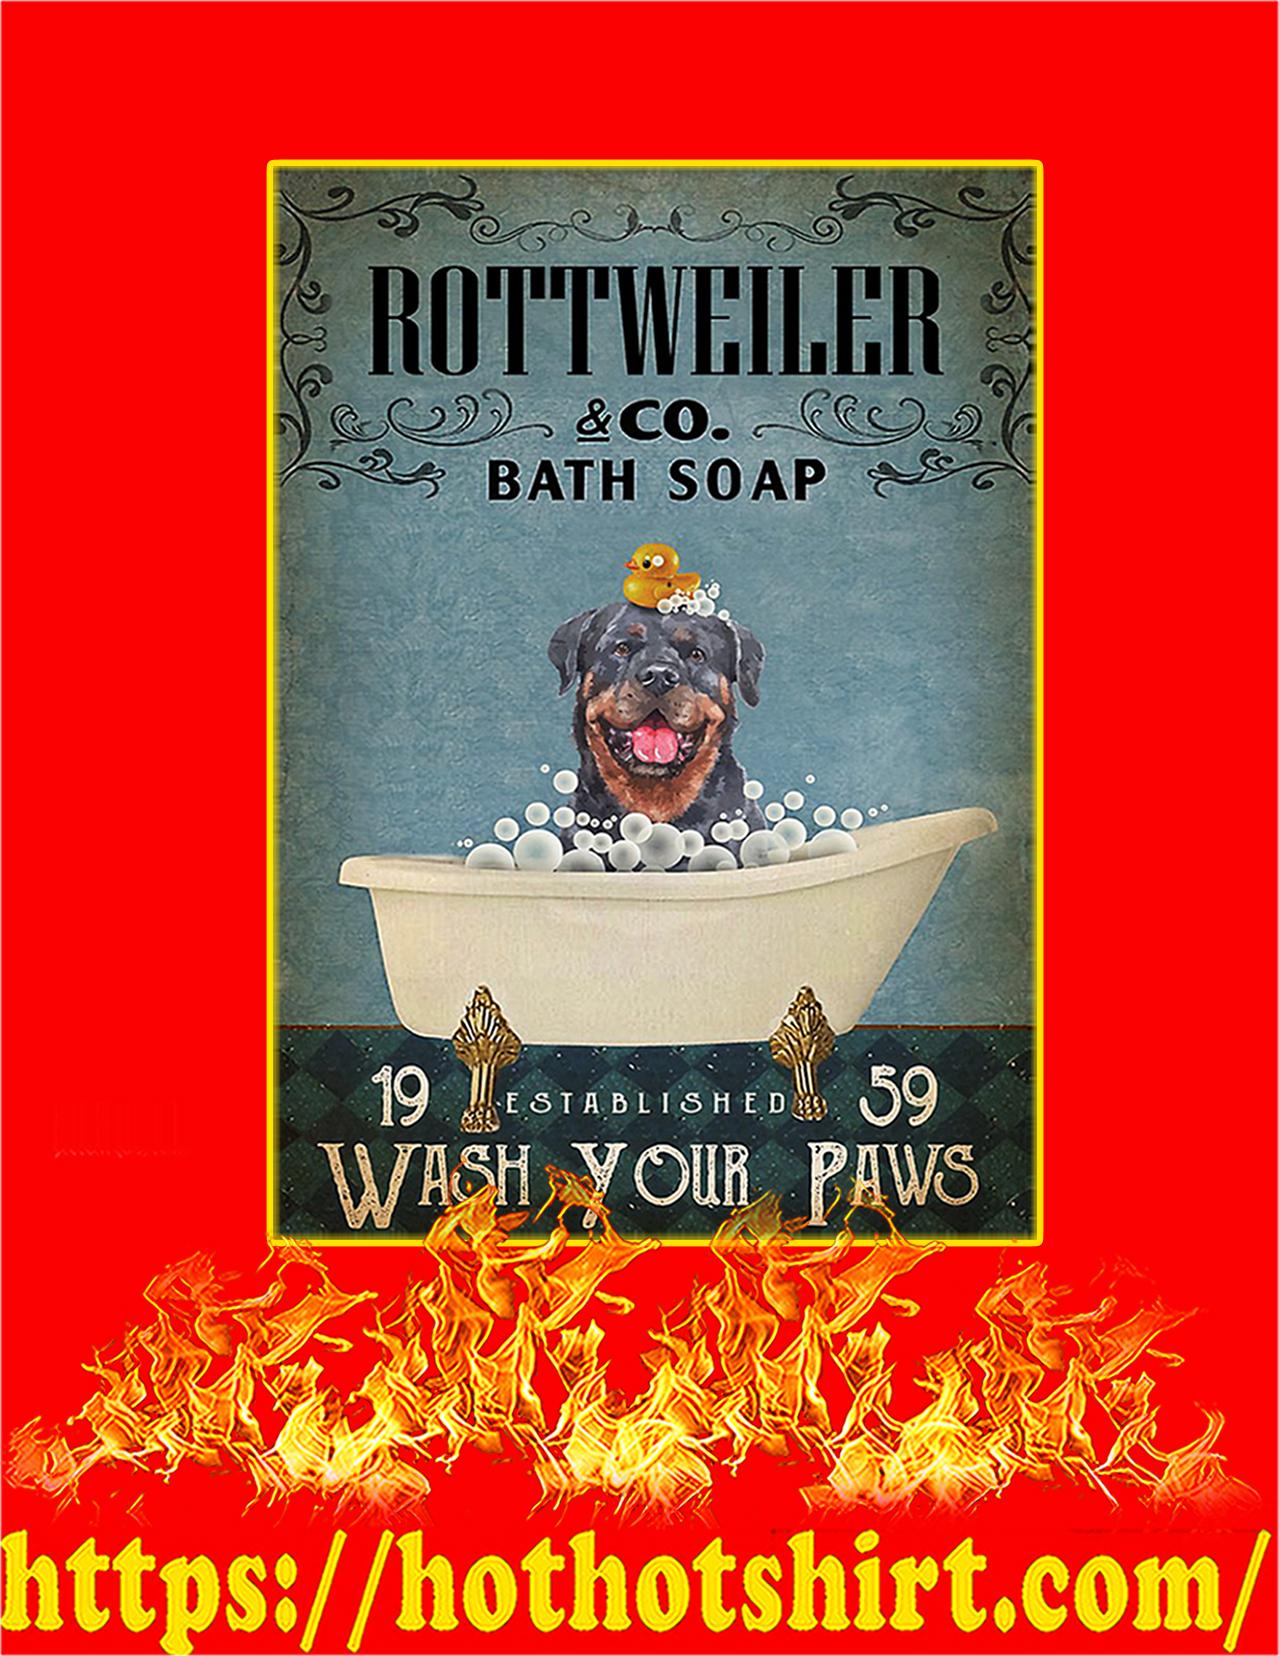 Bath soap company rottweiler poster - A2